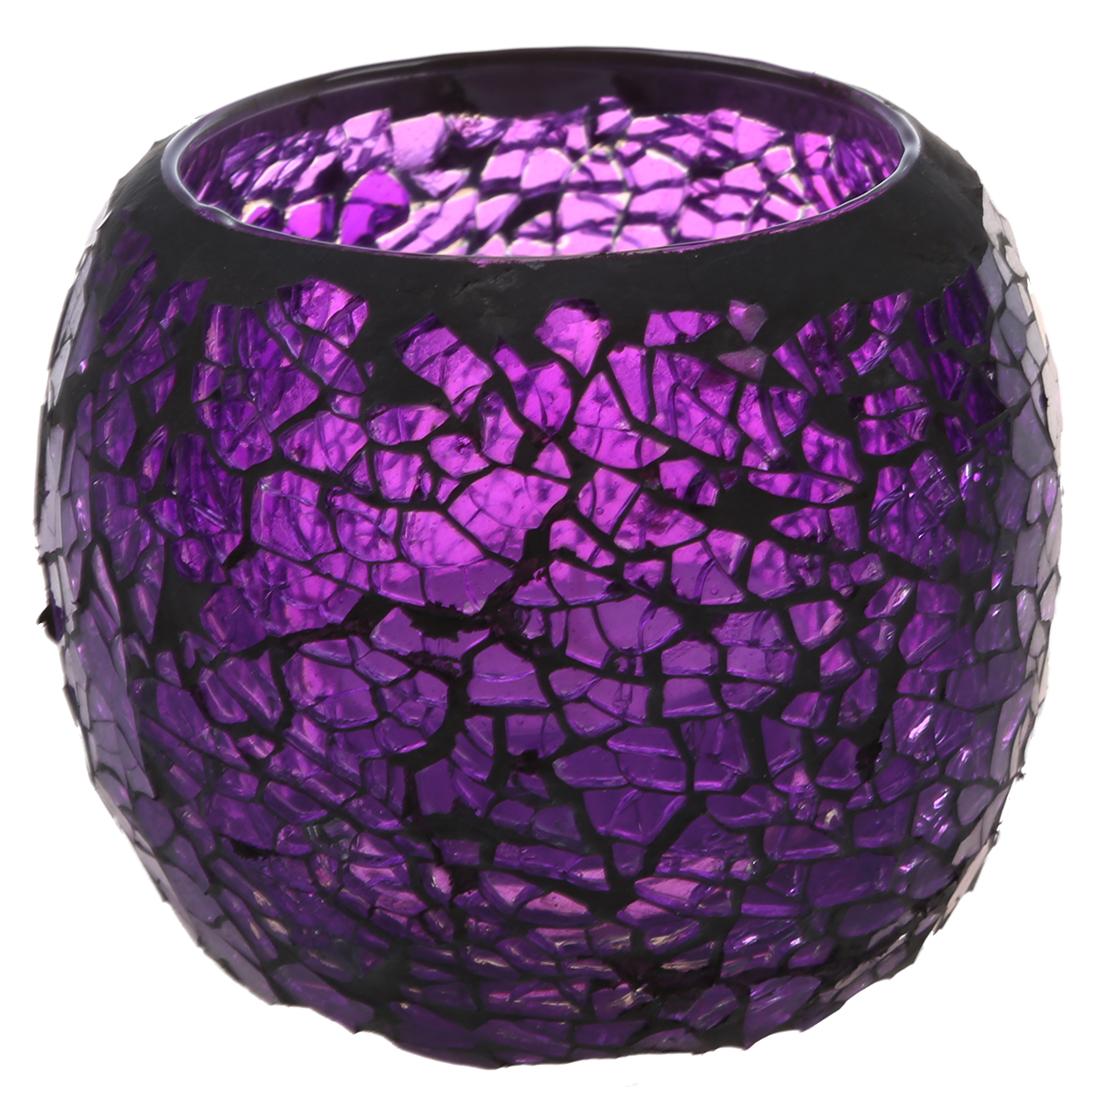 Handgefertigt deko glas teelicht kerzenhalter schwarz rand for Teelicht deko